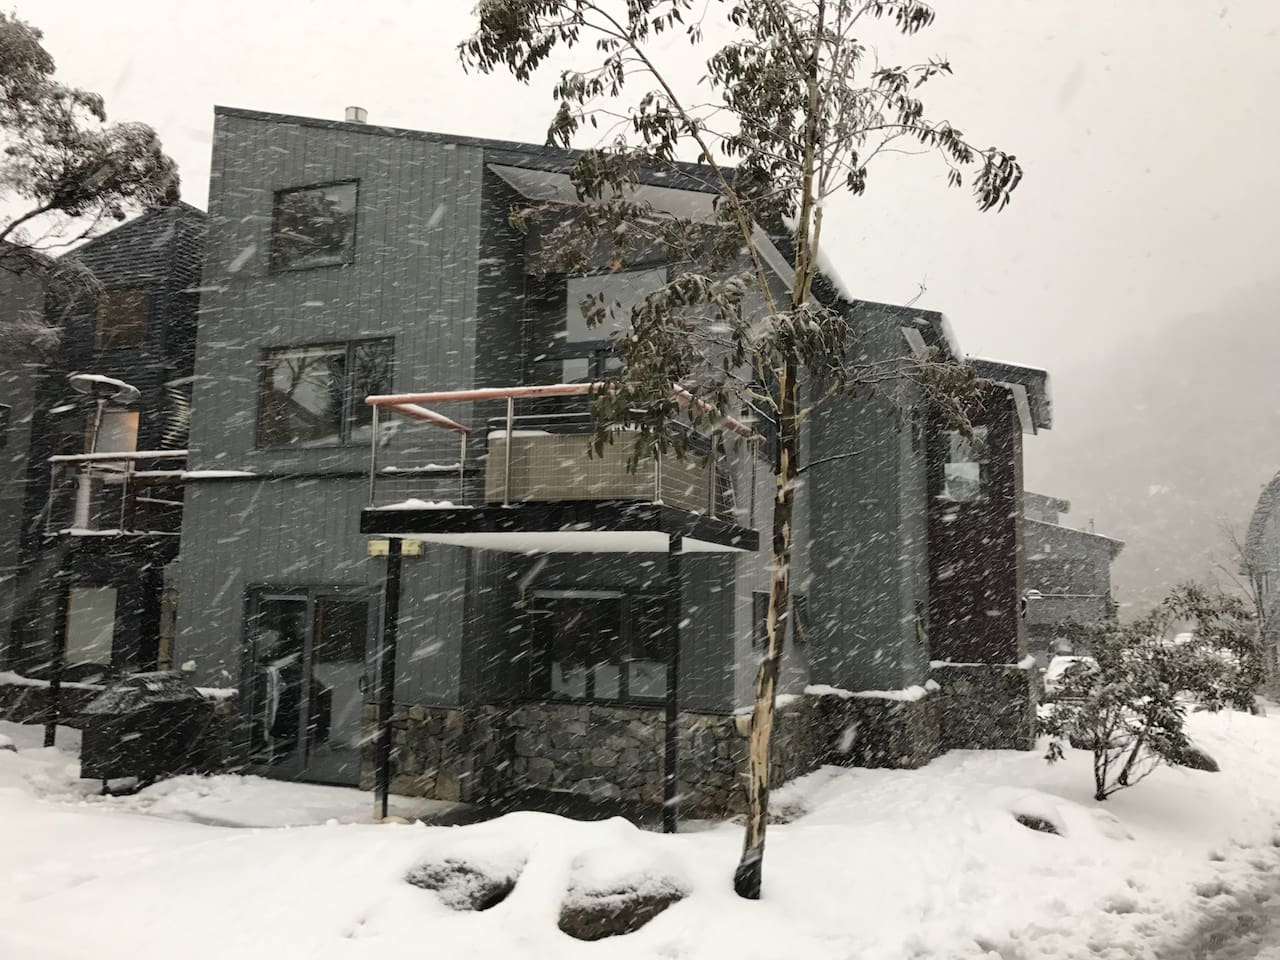 Onyx 3 in full snow